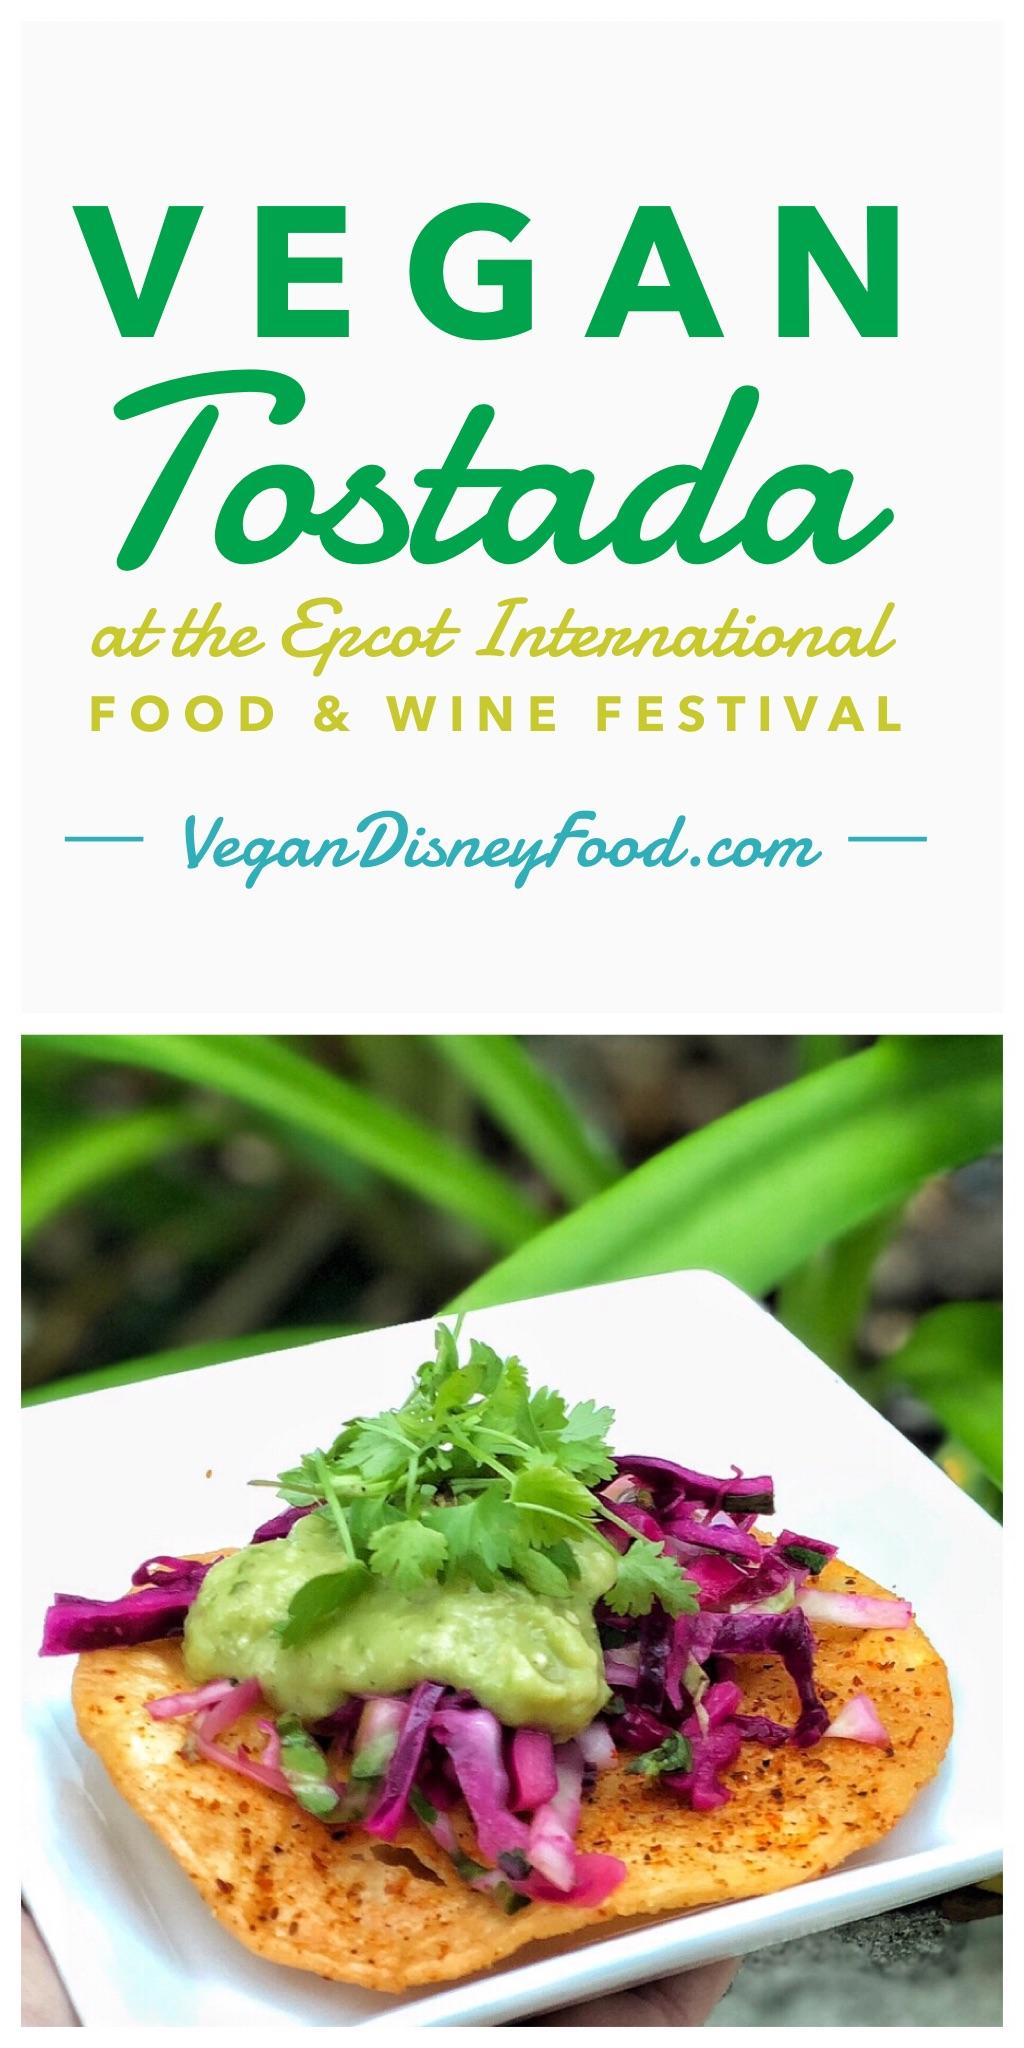 Vegan Tostada at the 2019 Epcot International Food and Wine Festival at Walt Disney World